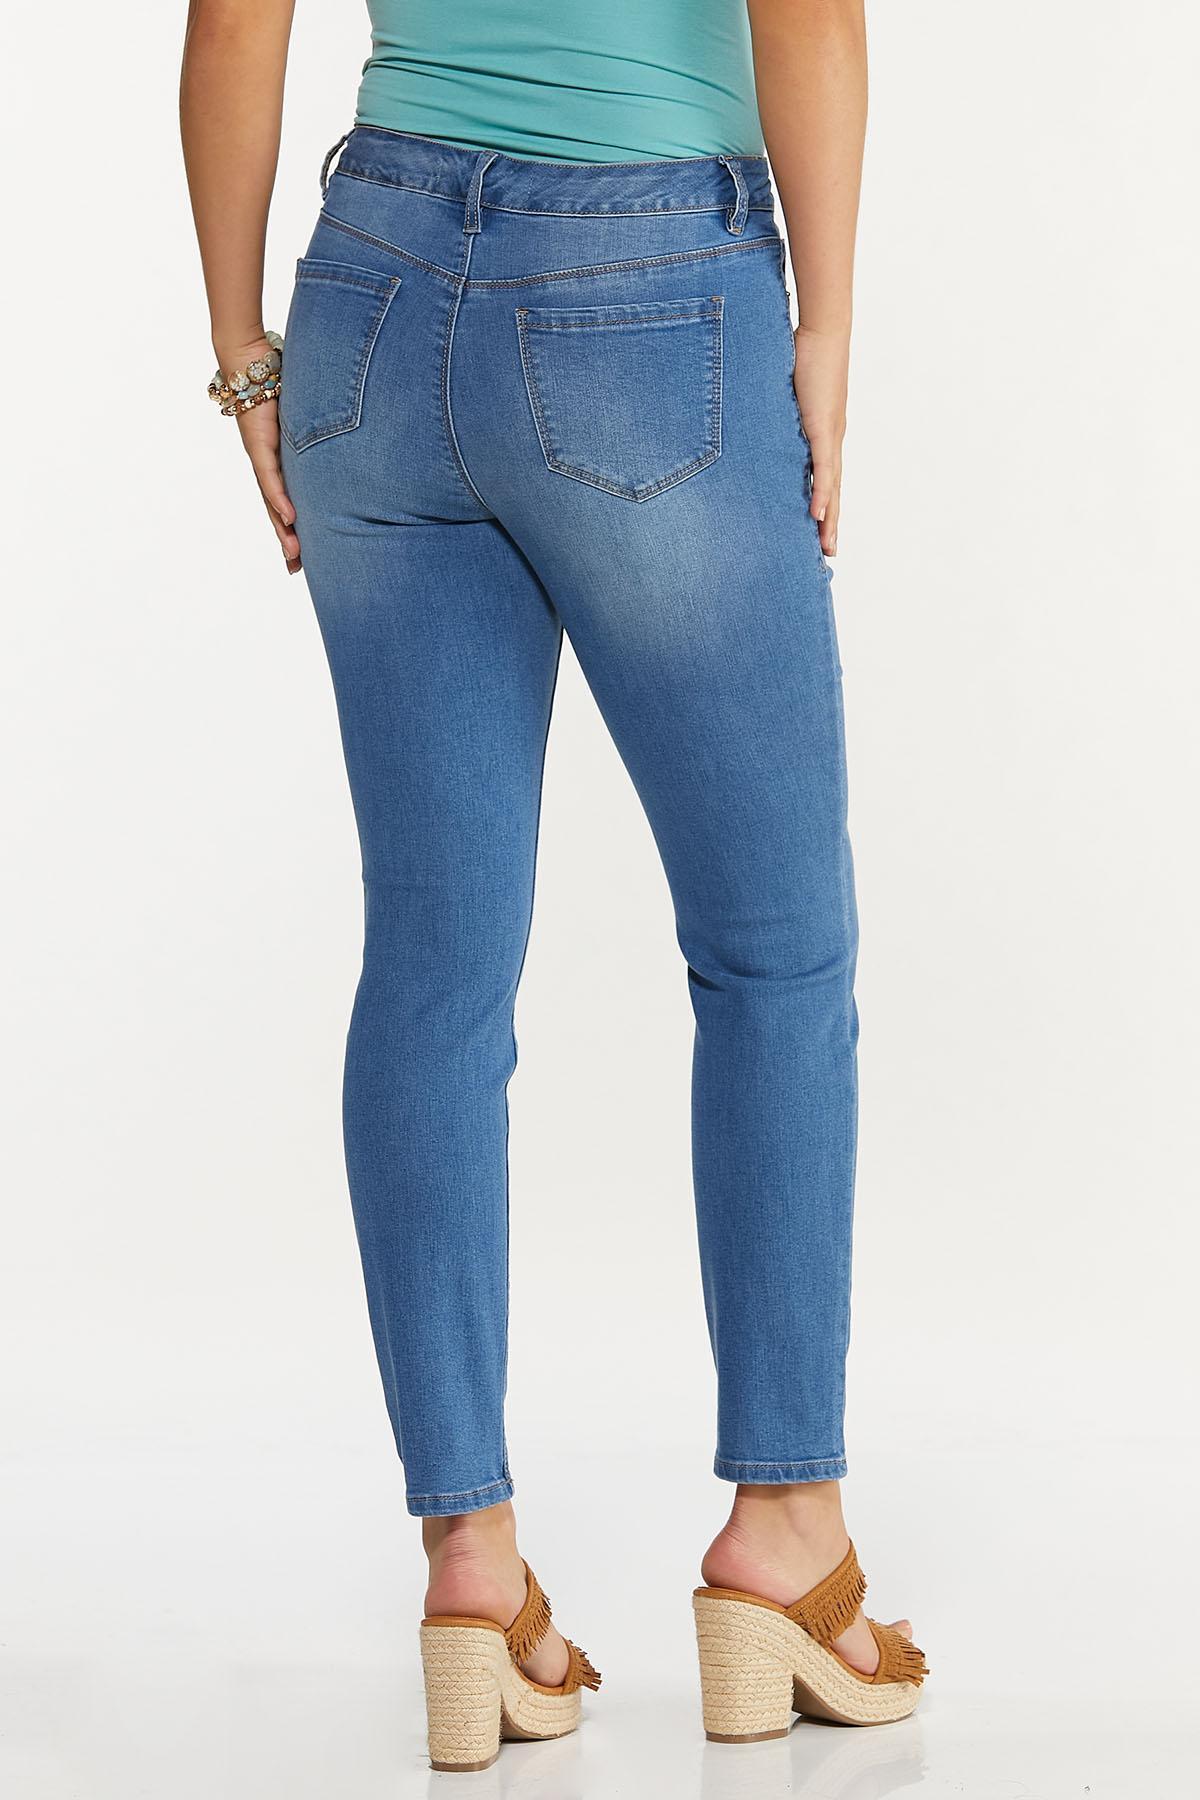 Light High-Rise Skinny Jeans (Item #44606583)